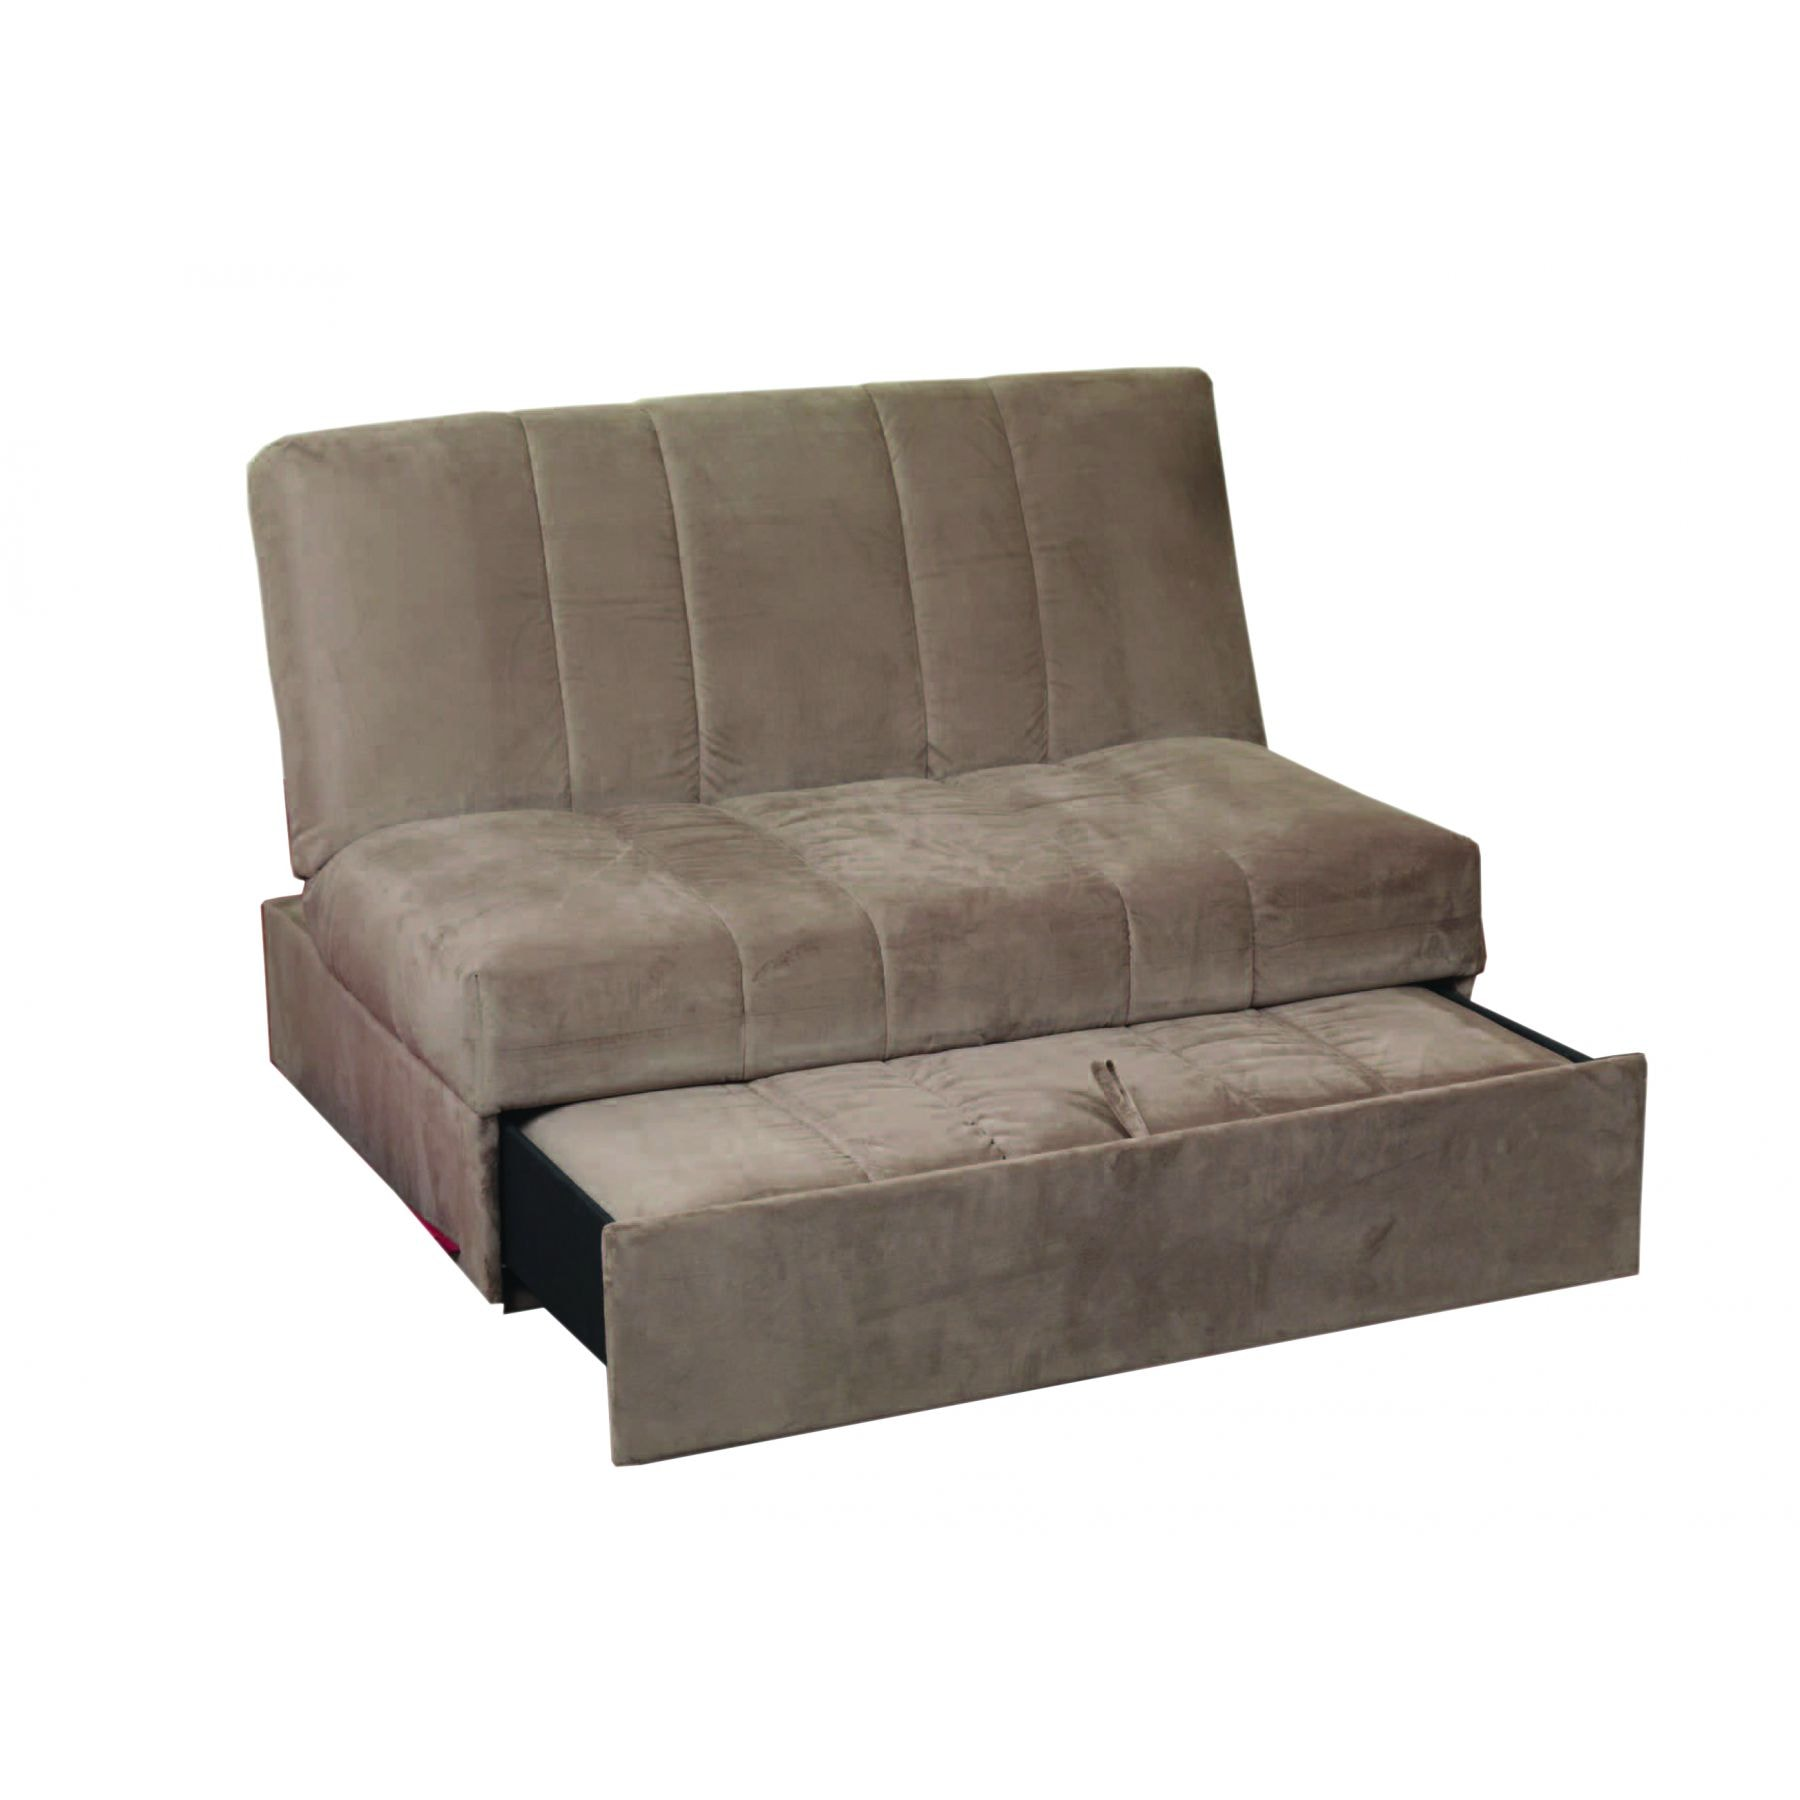 rome 2 seater sofa bed. Black Bedroom Furniture Sets. Home Design Ideas